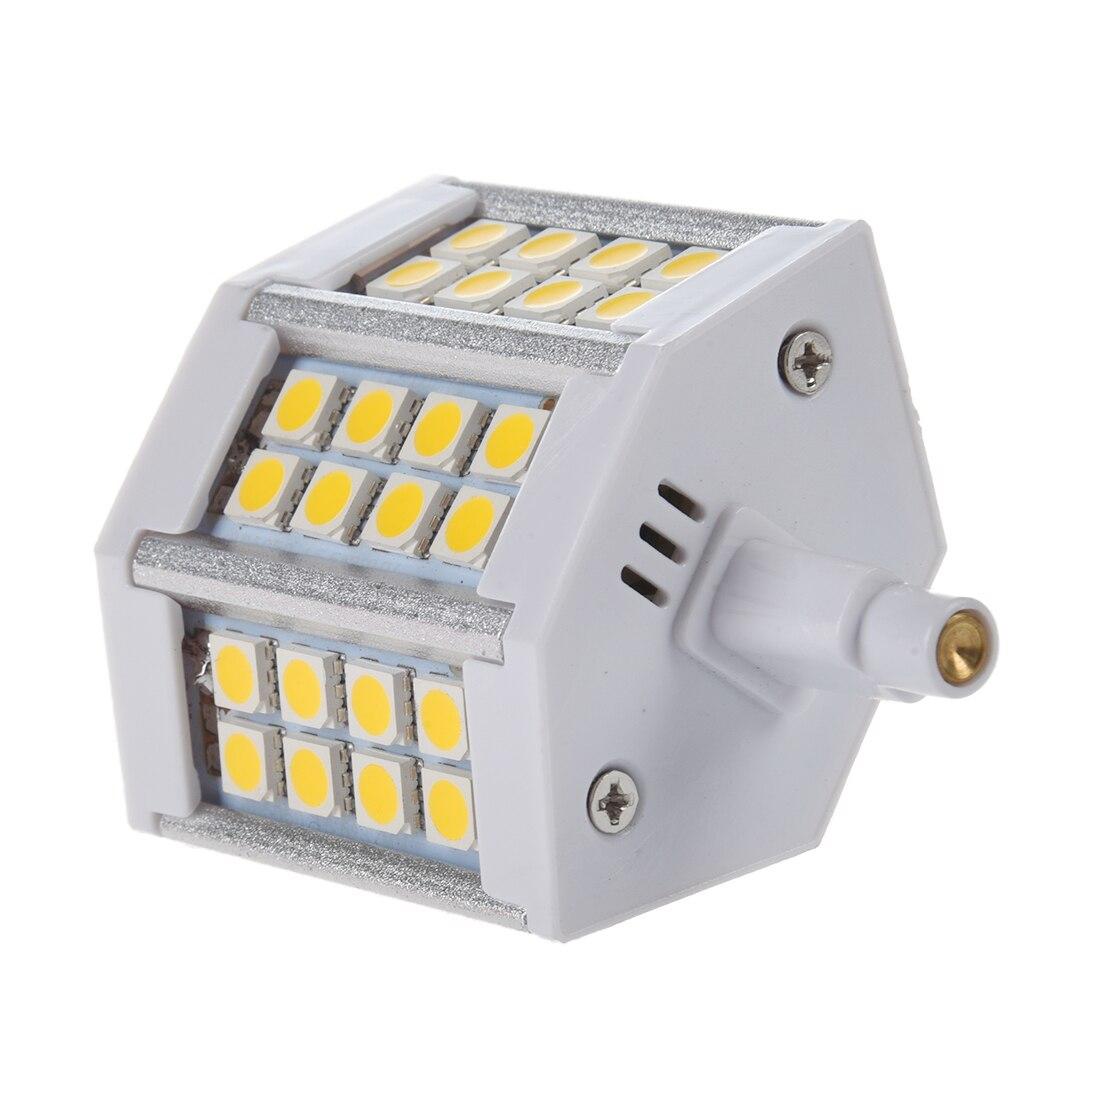 2x R7S/ J78 78mm 5050SMD 5W LED Floodlight